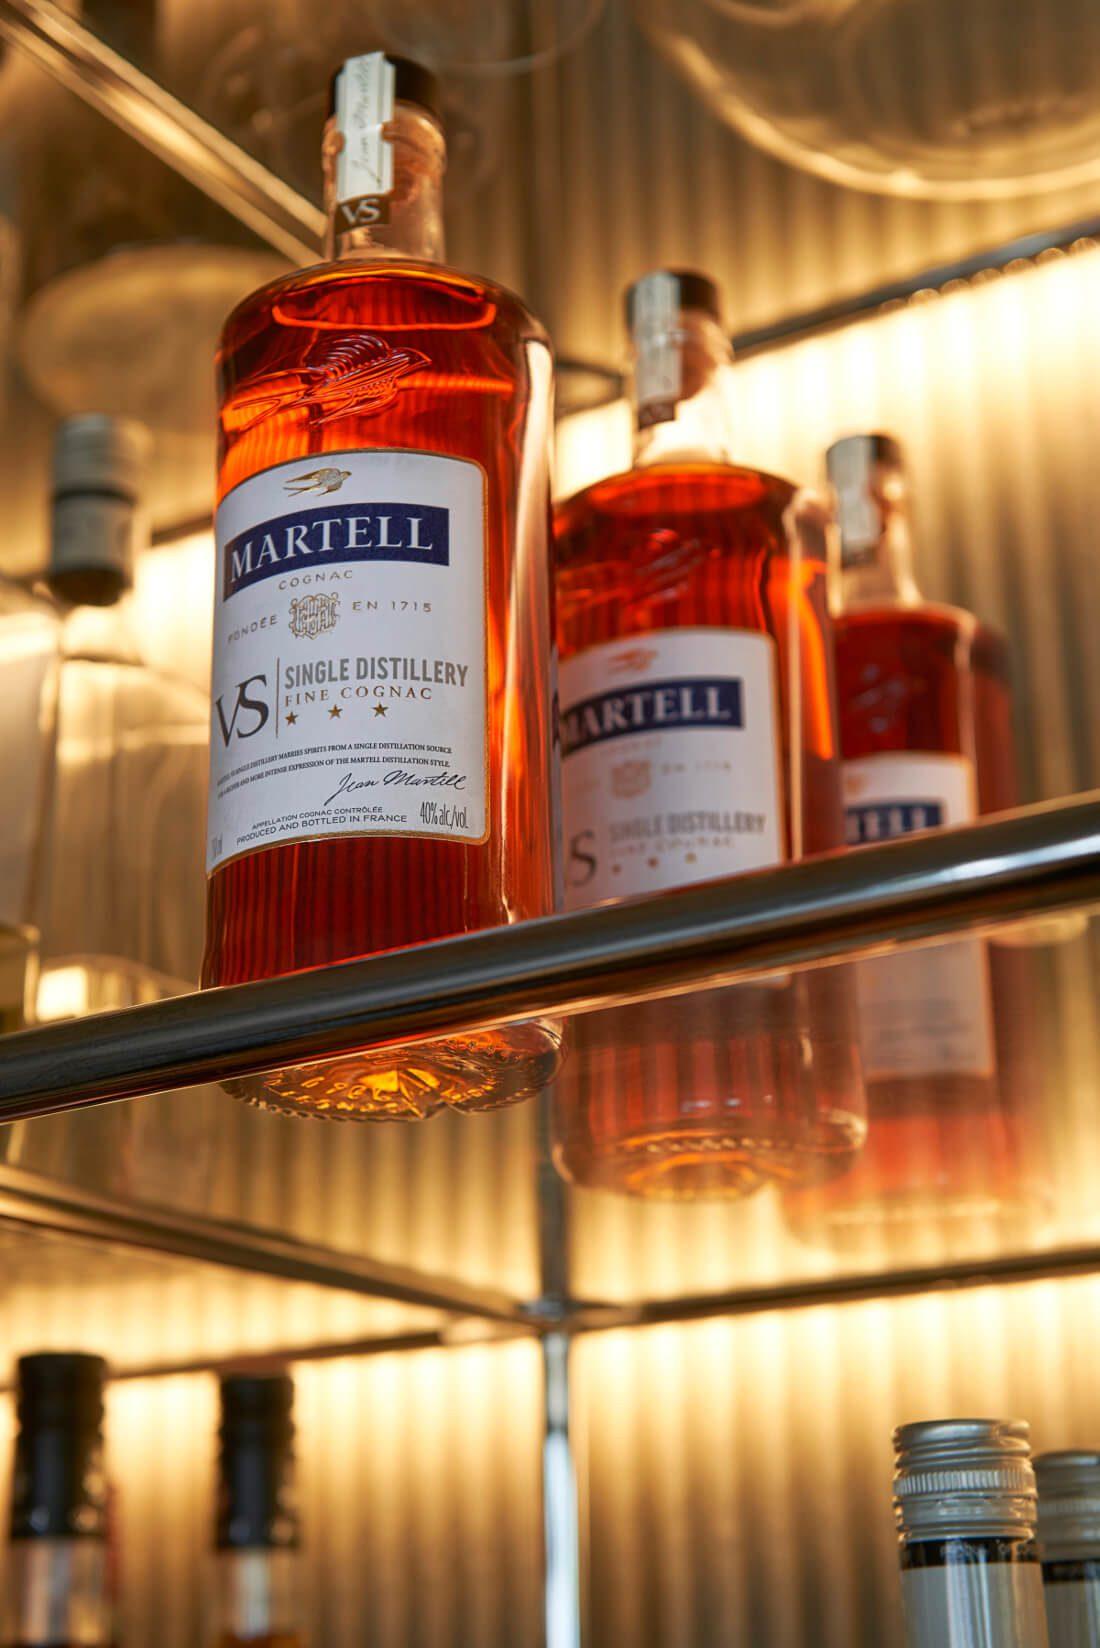 martell-vs-single-distillery-digital-picture-raw-visual-3